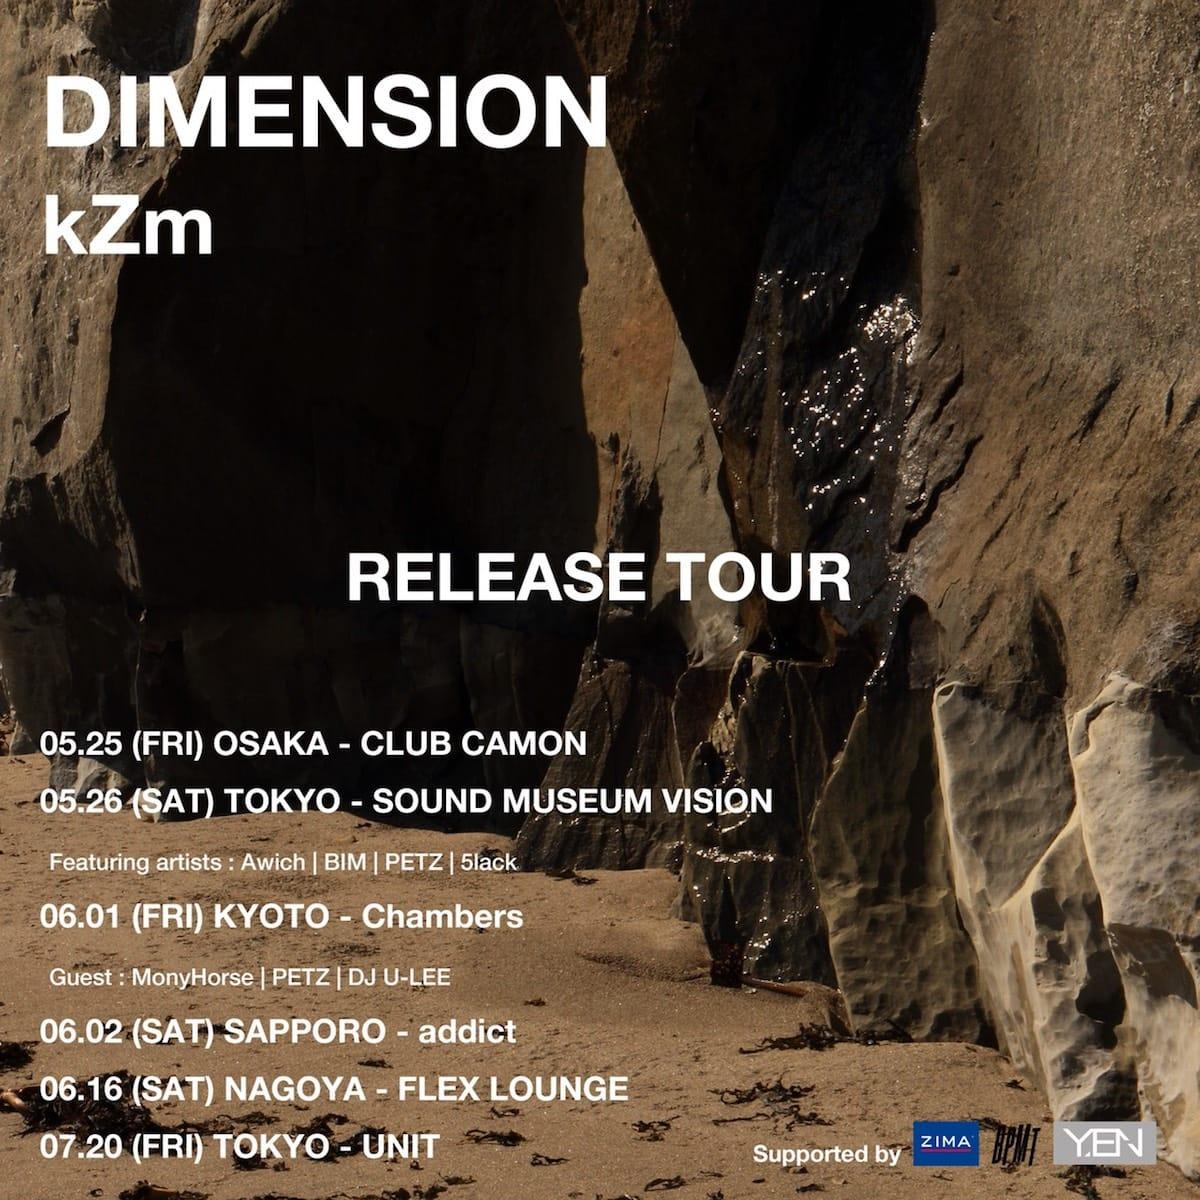 kZm(YENTOWN)が1stアルバム『DIMENSION』のリリースツアーを発表! music180522-kzm-3-1200x1200